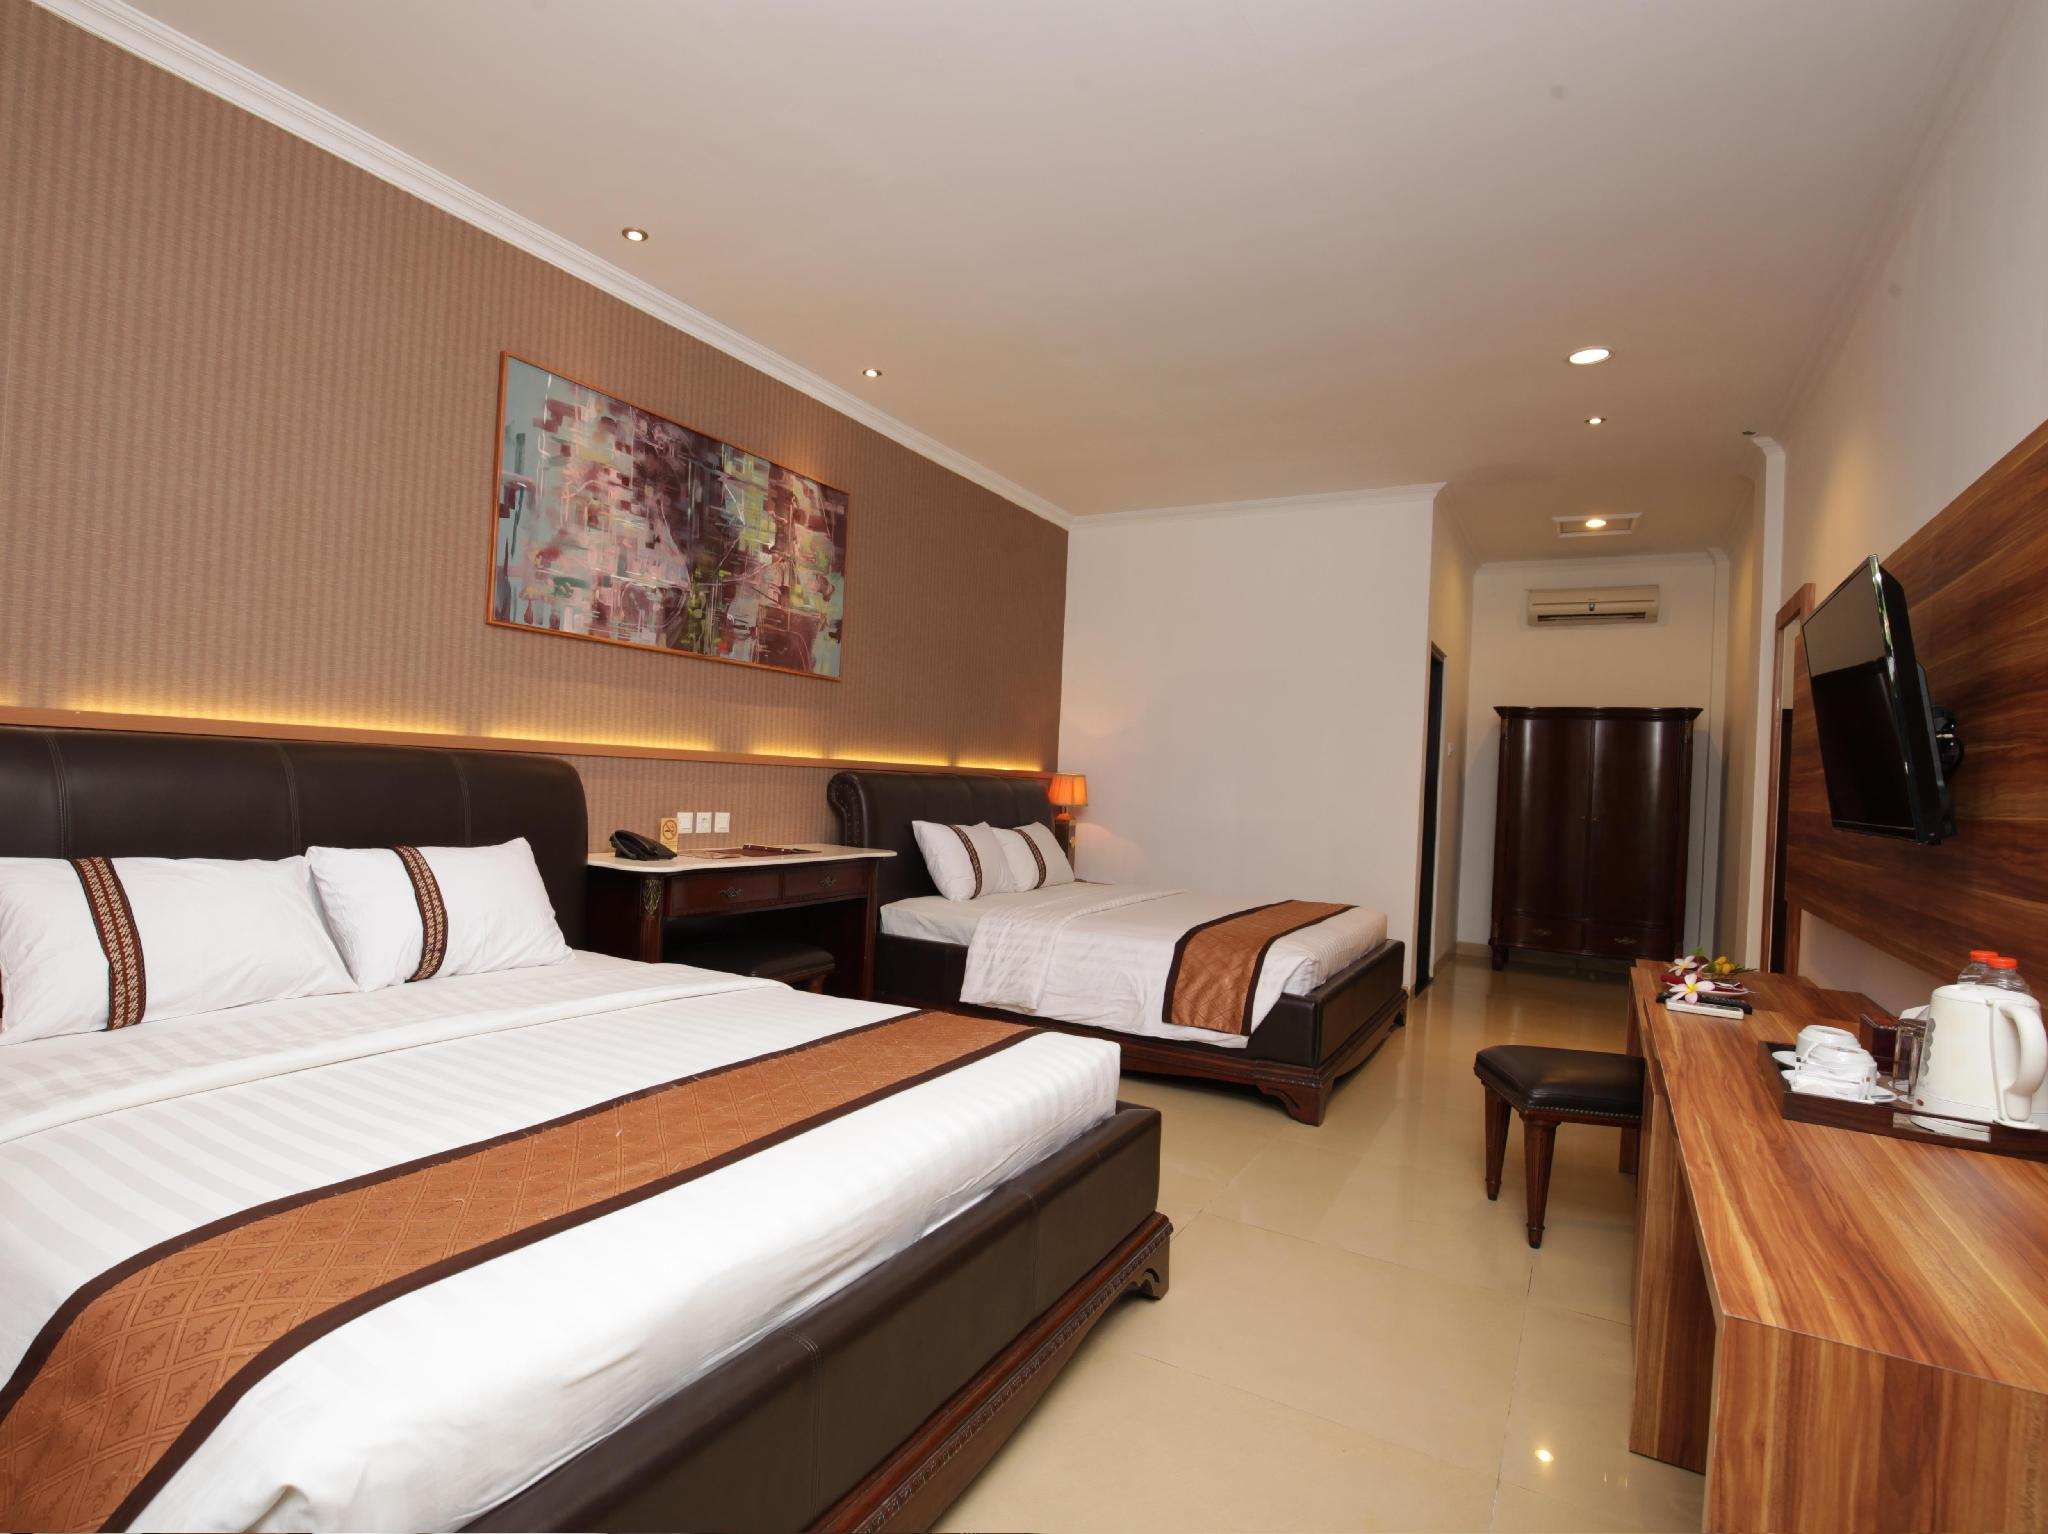 The Grand Palace Hotel Yogyakarta Indonesia Jaminan Harga